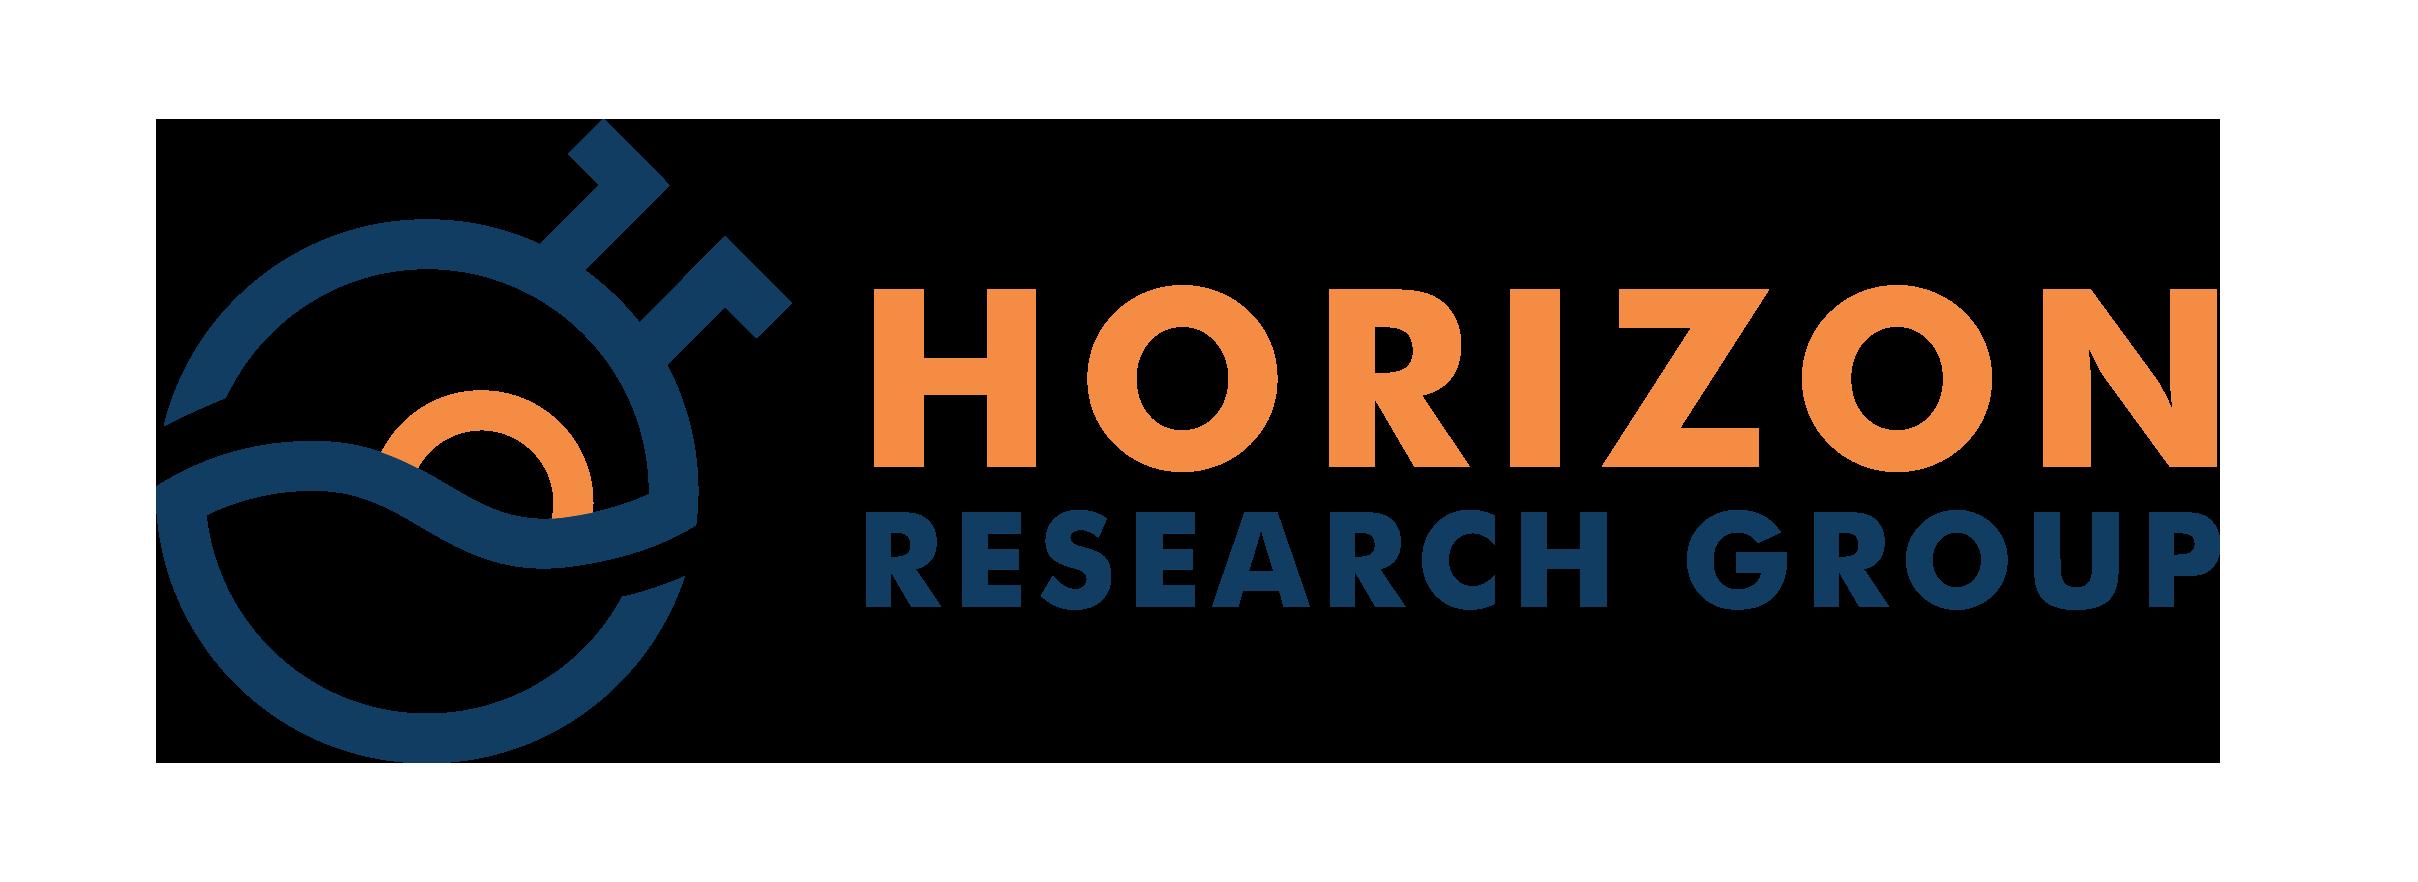 Horizon Research Group